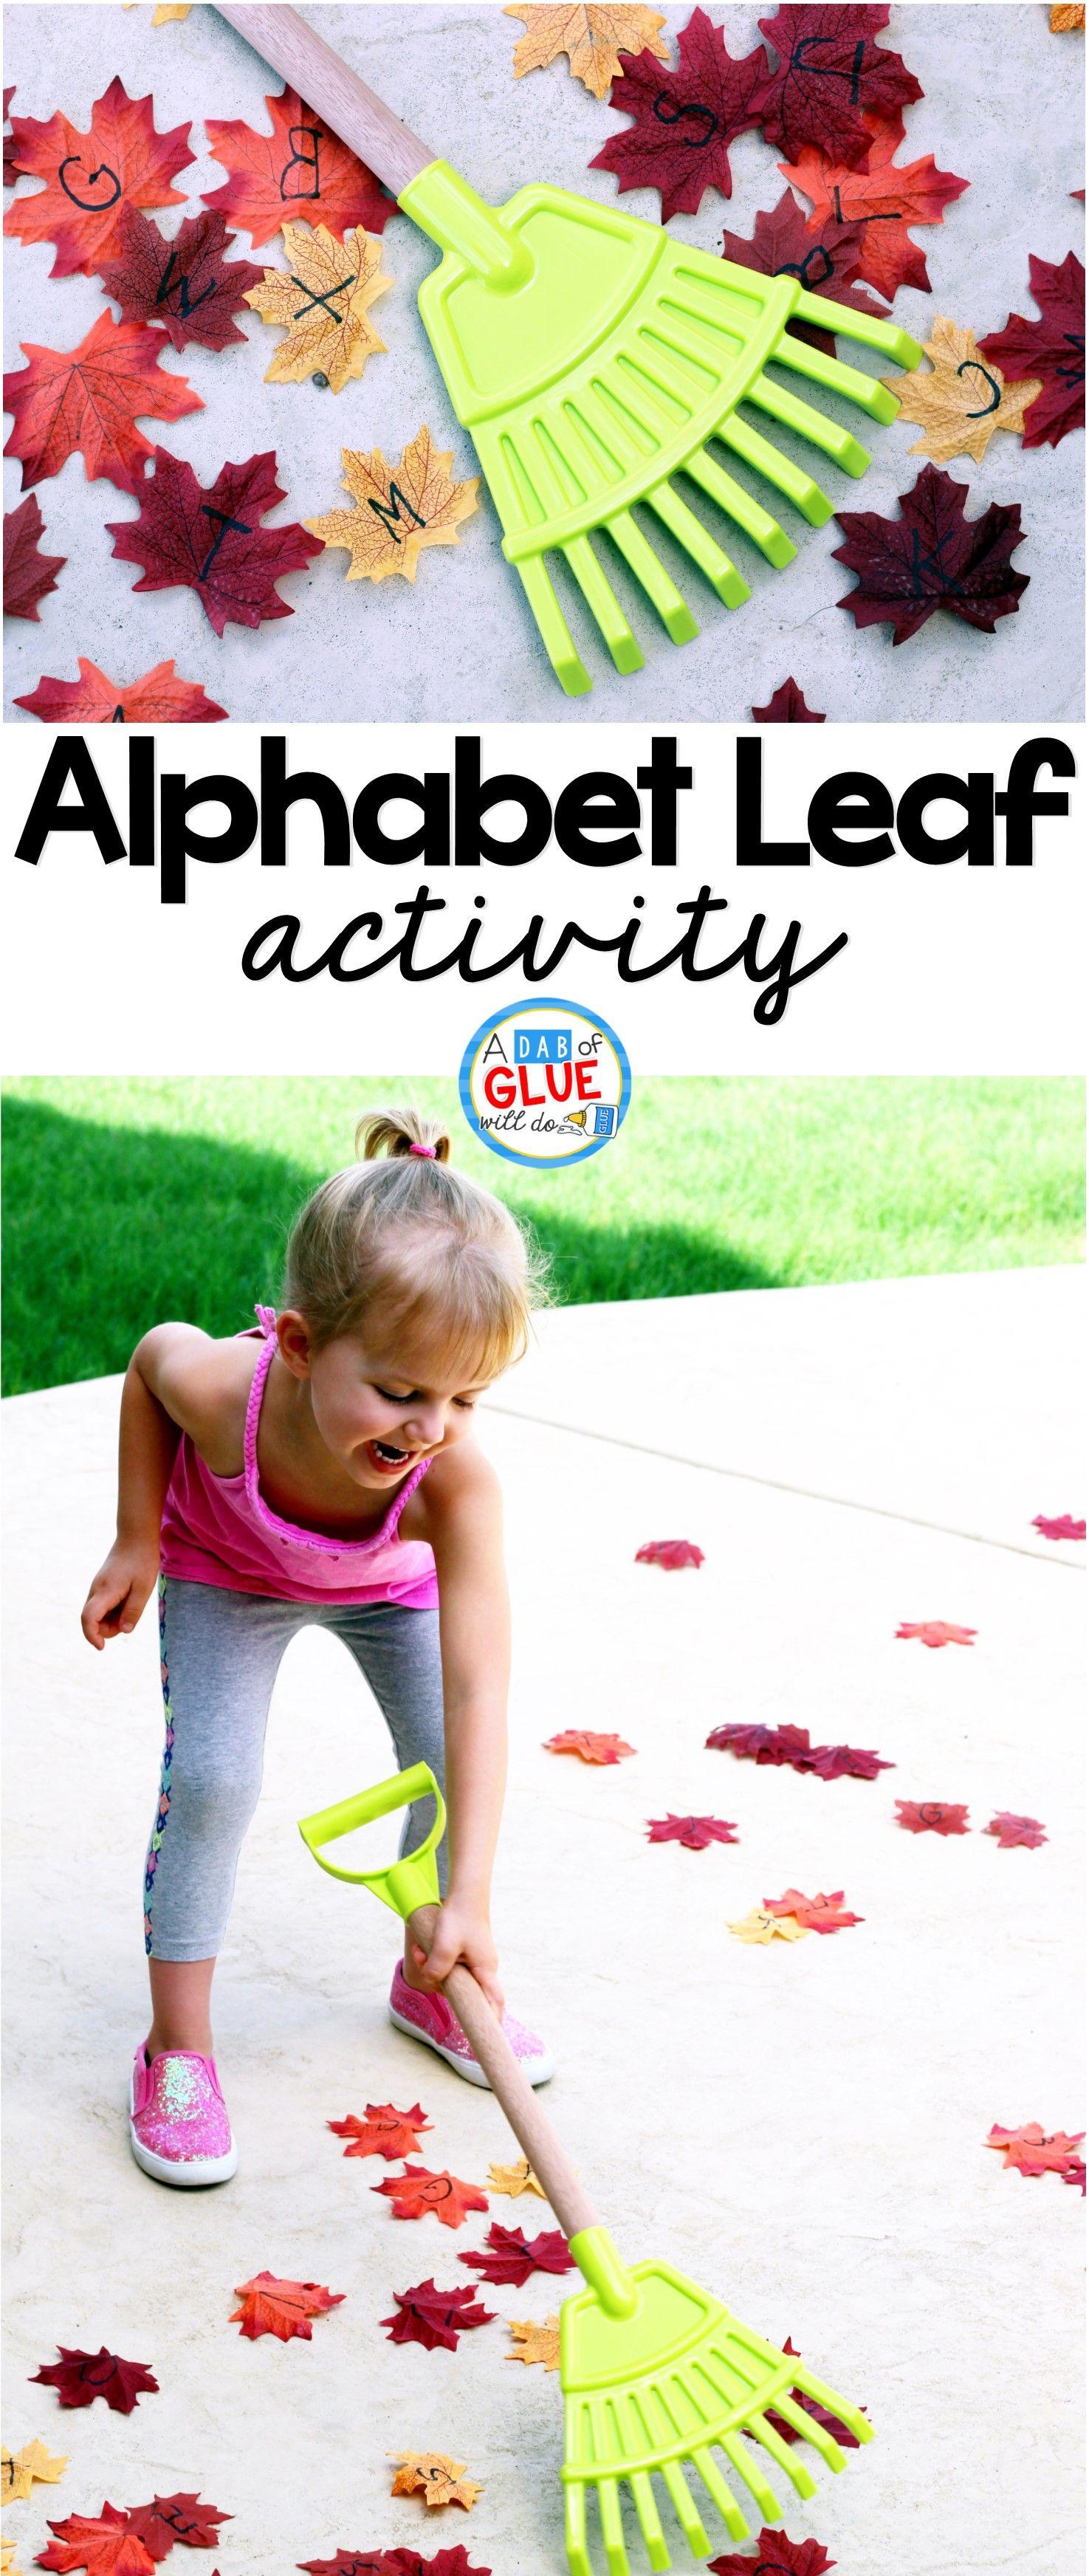 Alphabet Leaf Activity